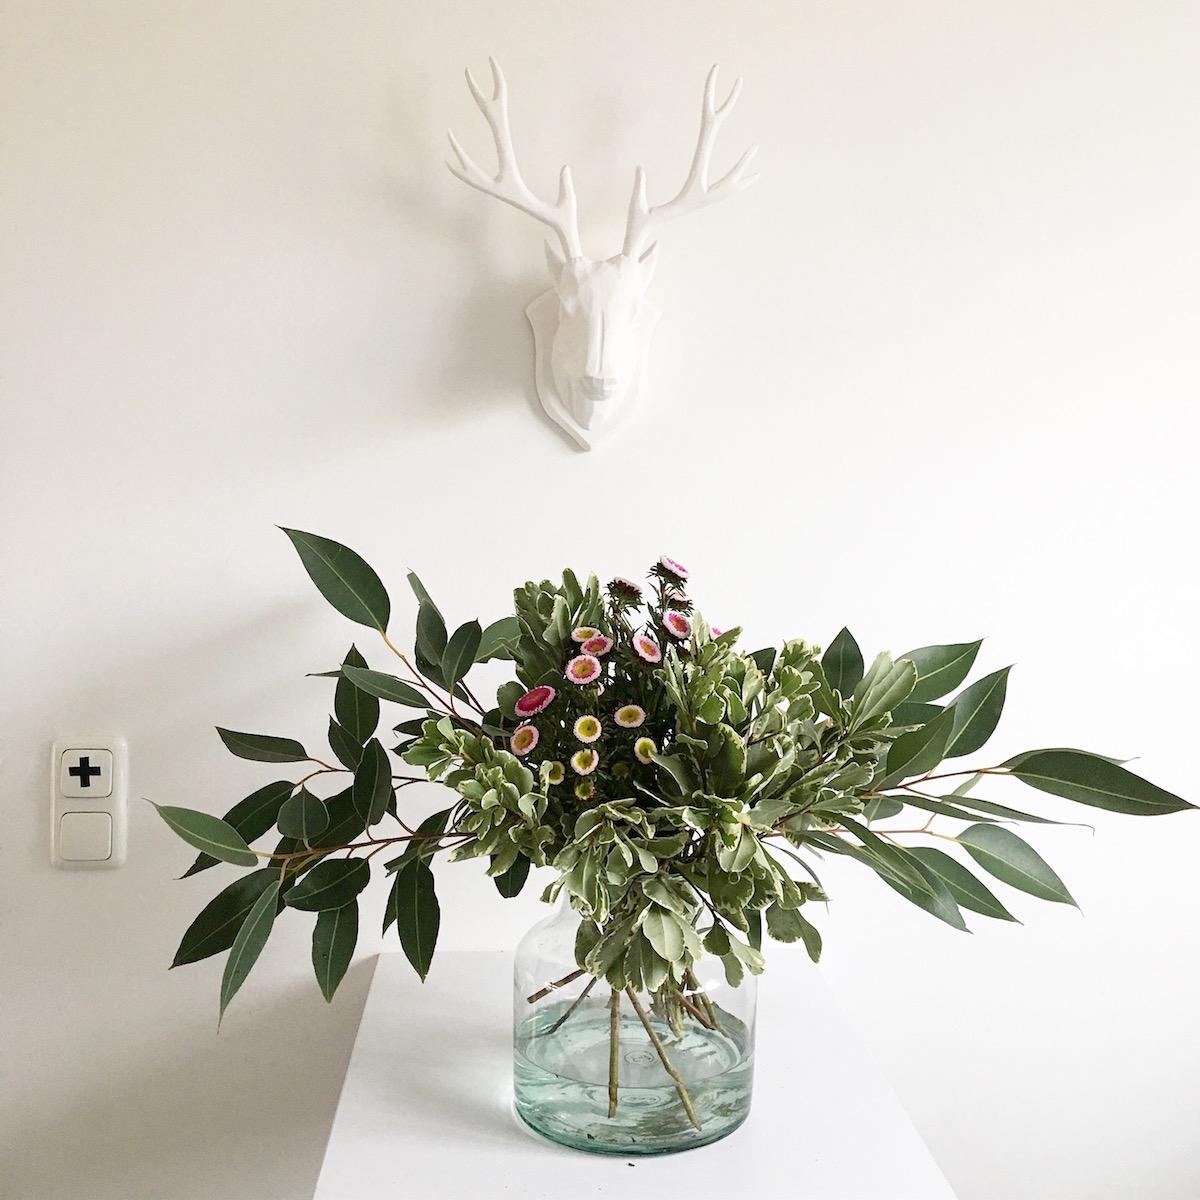 herbst blumen deko sophiagaleria sophiagaleria. Black Bedroom Furniture Sets. Home Design Ideas